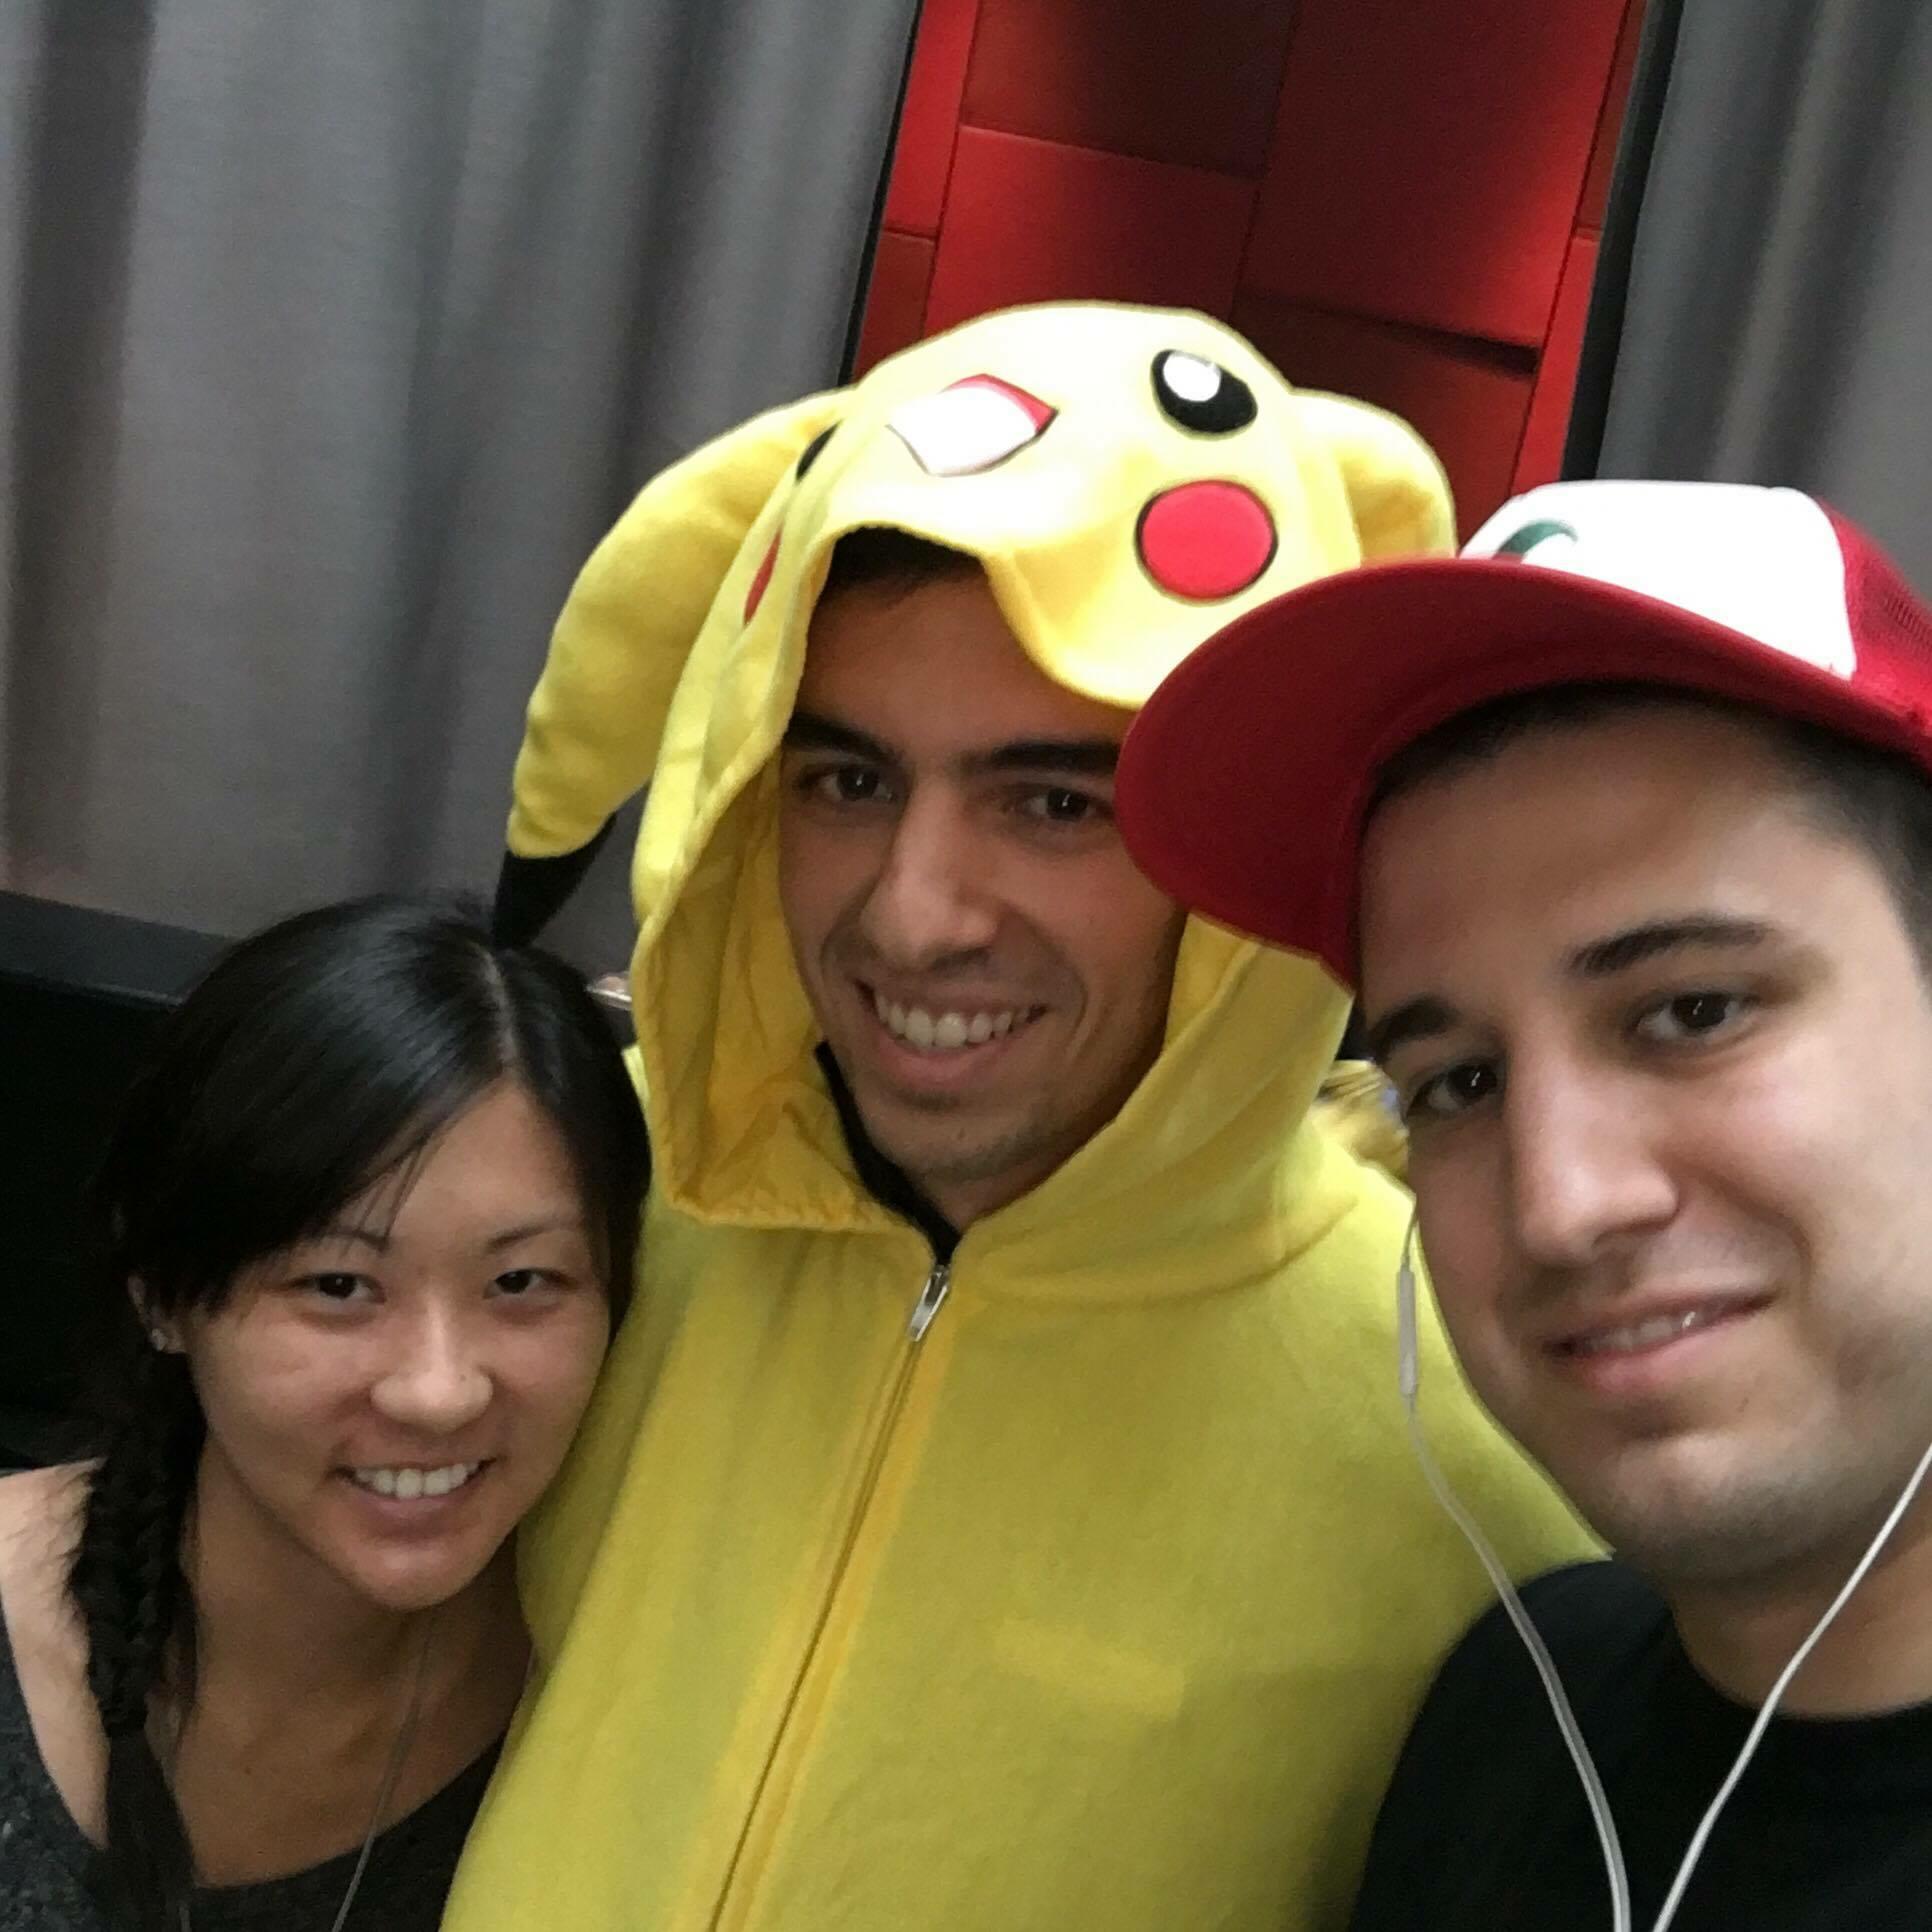 pikachu snuggie nick johnson Pokémon Go